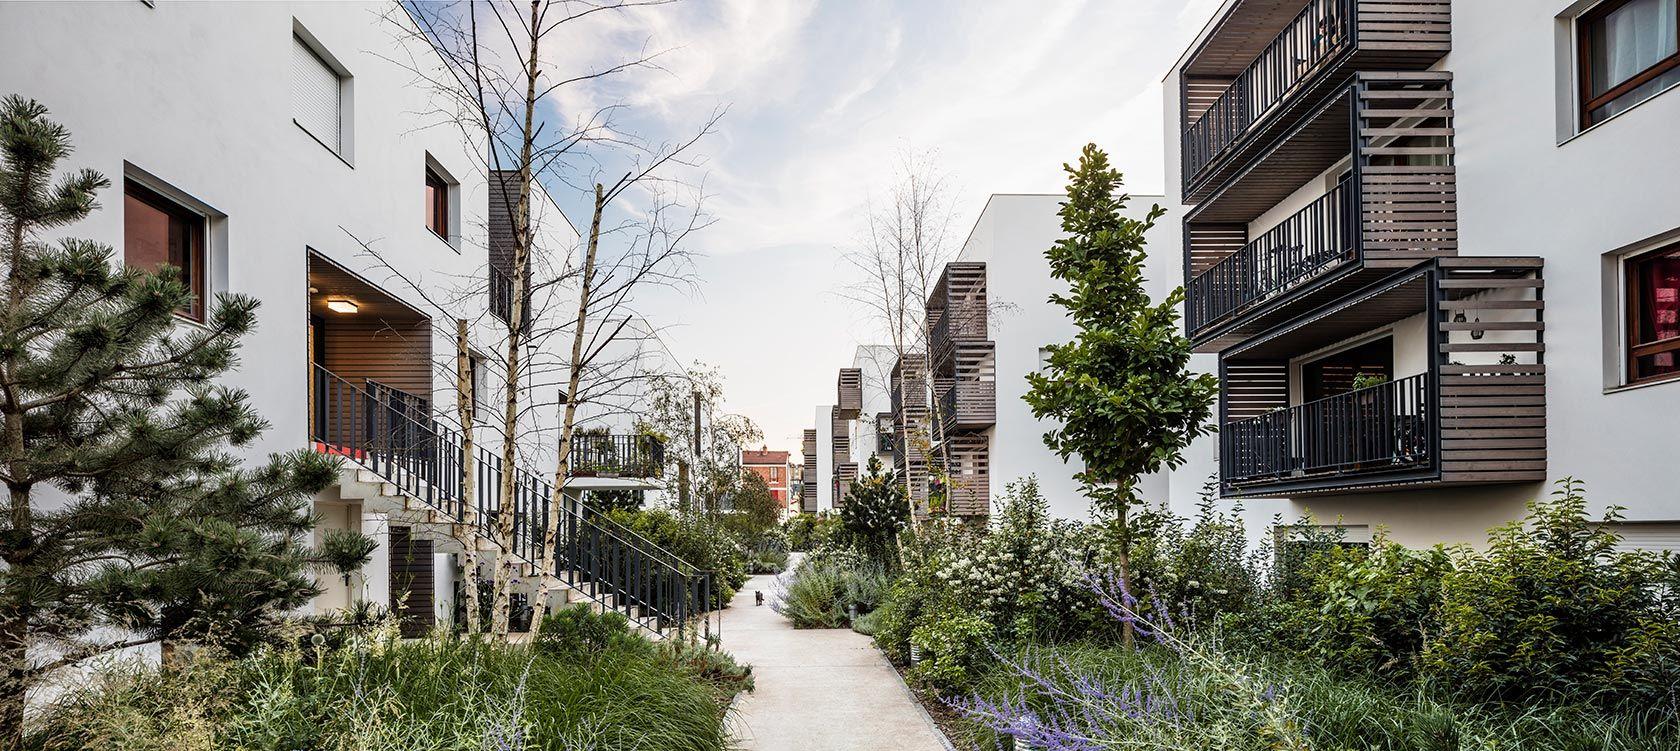 eco quartier carnot verollot ivry sur seine archikubik ref paysage pinterest urban design. Black Bedroom Furniture Sets. Home Design Ideas